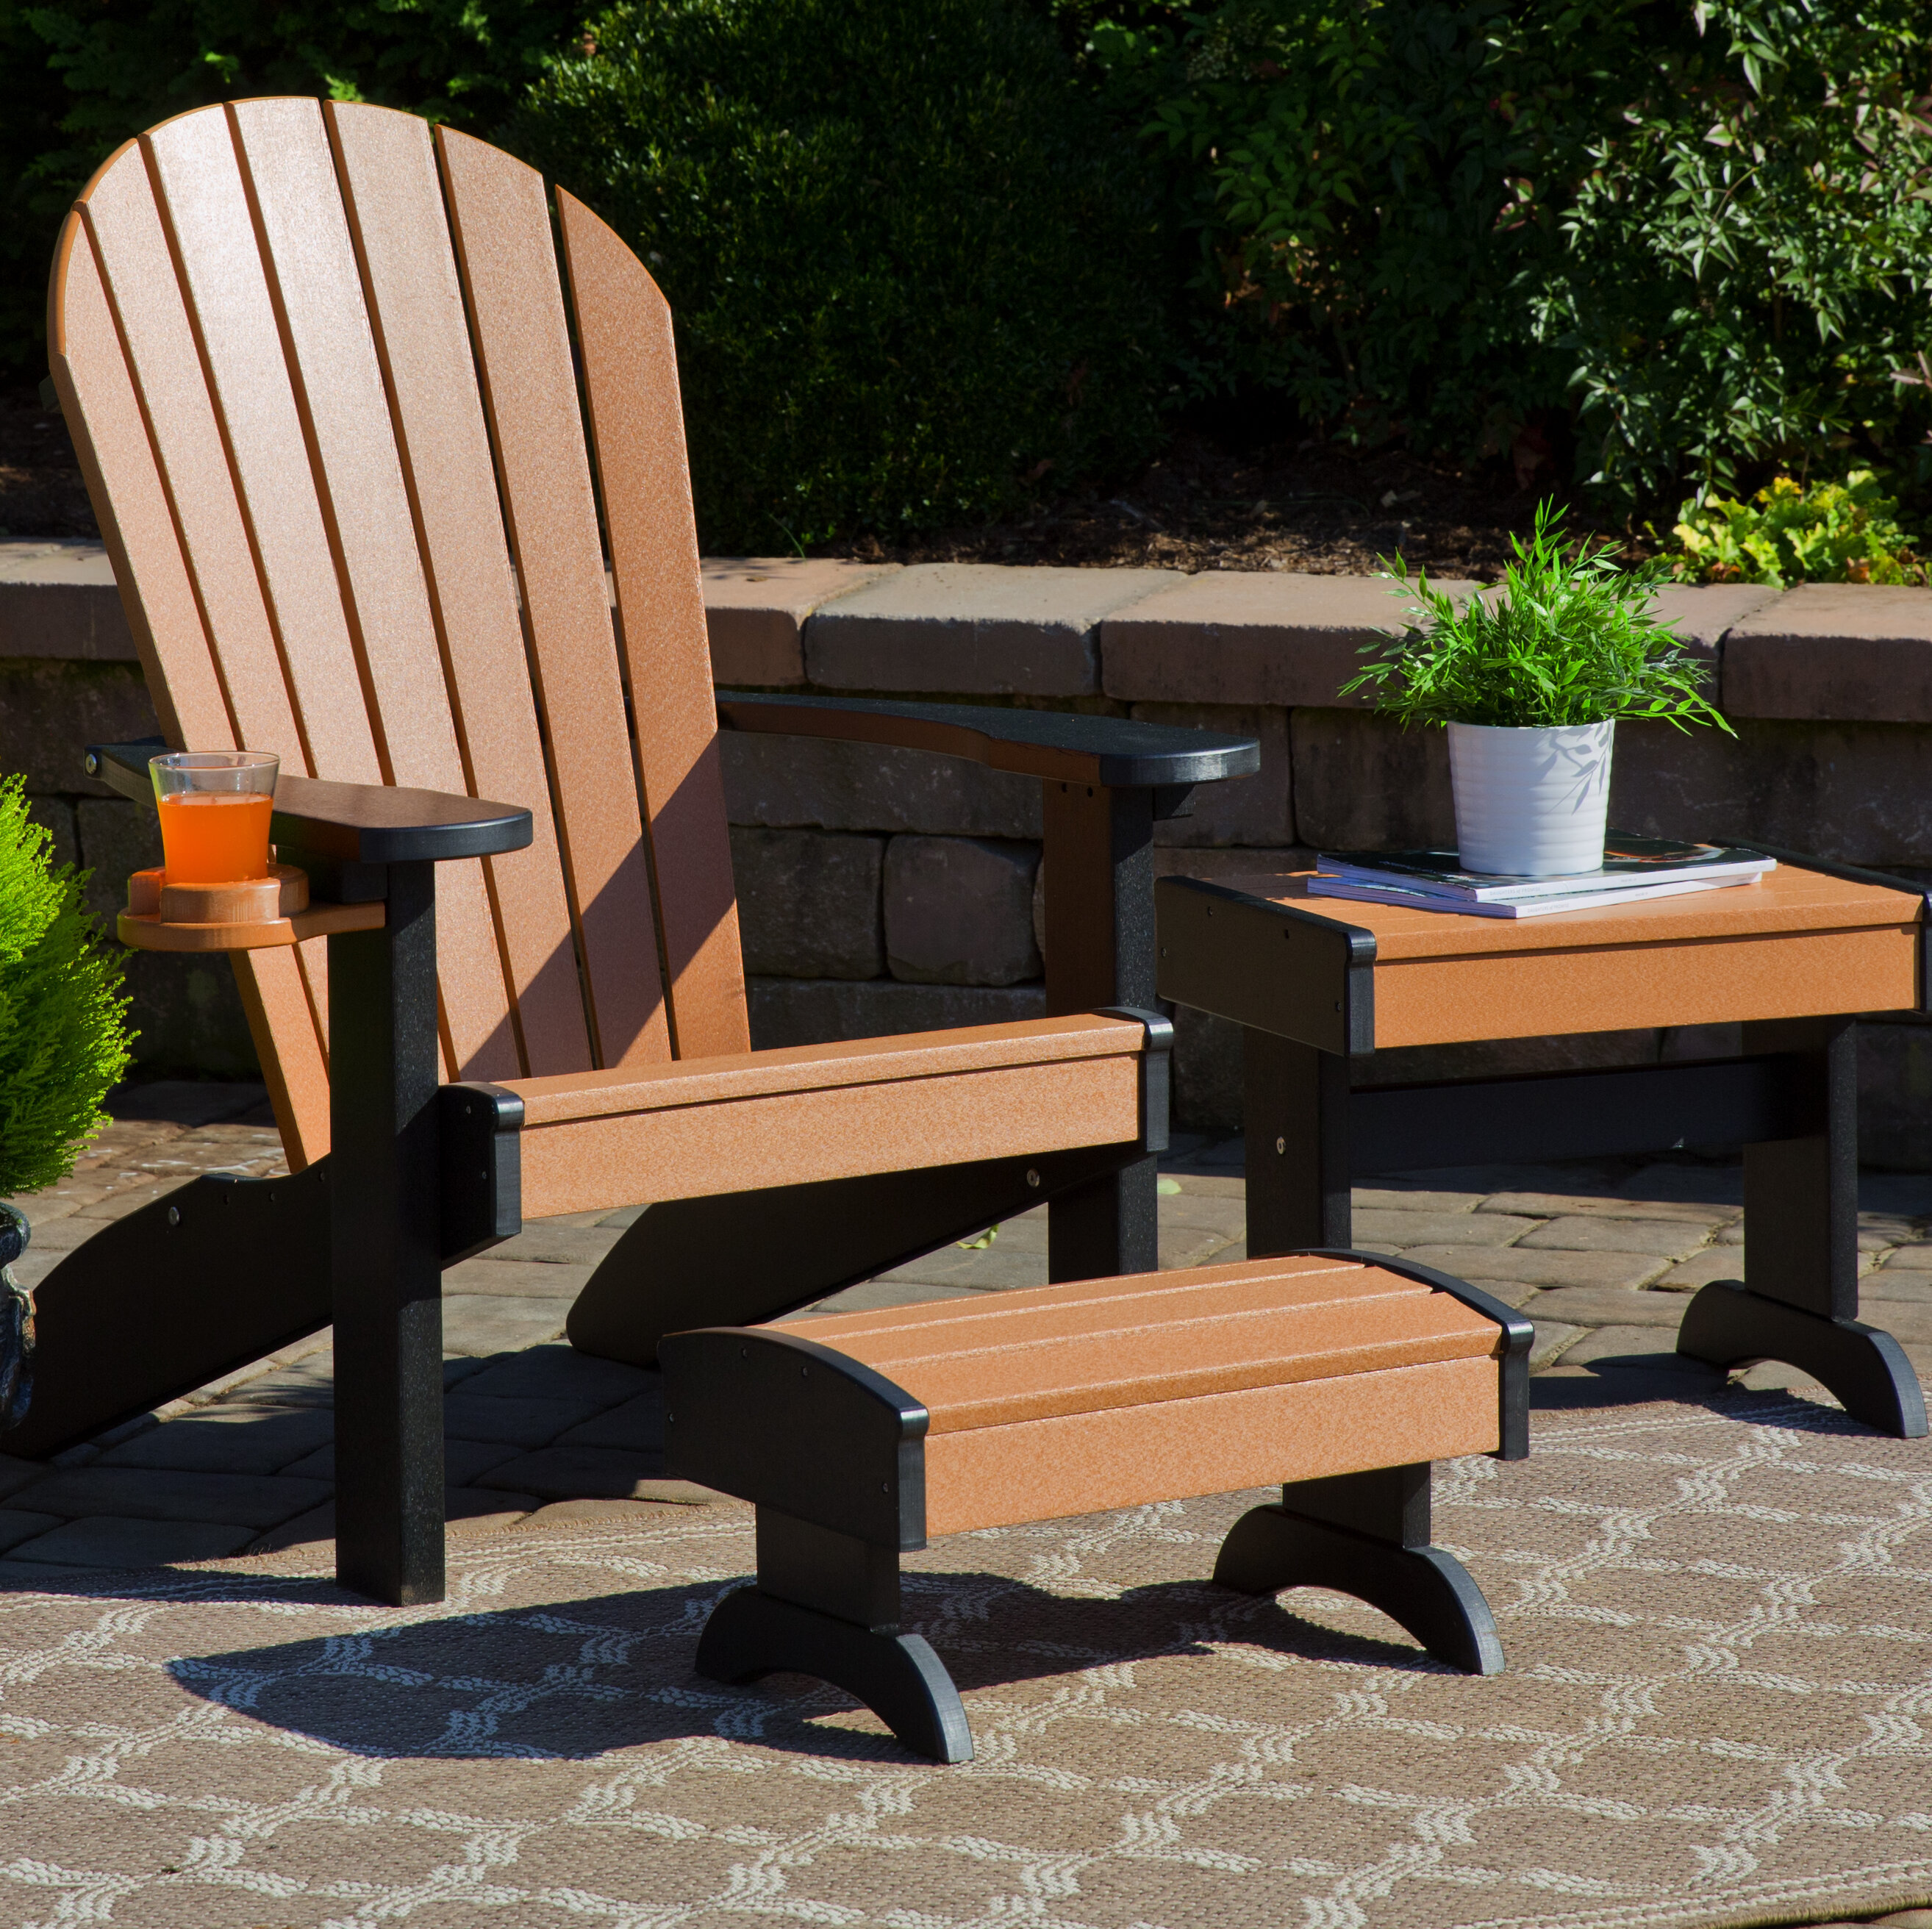 Plastic Adirondack Chairs With Ottoman.Kells 3 Piece Plastic Adirondack Chair Set With Ottoman And Table